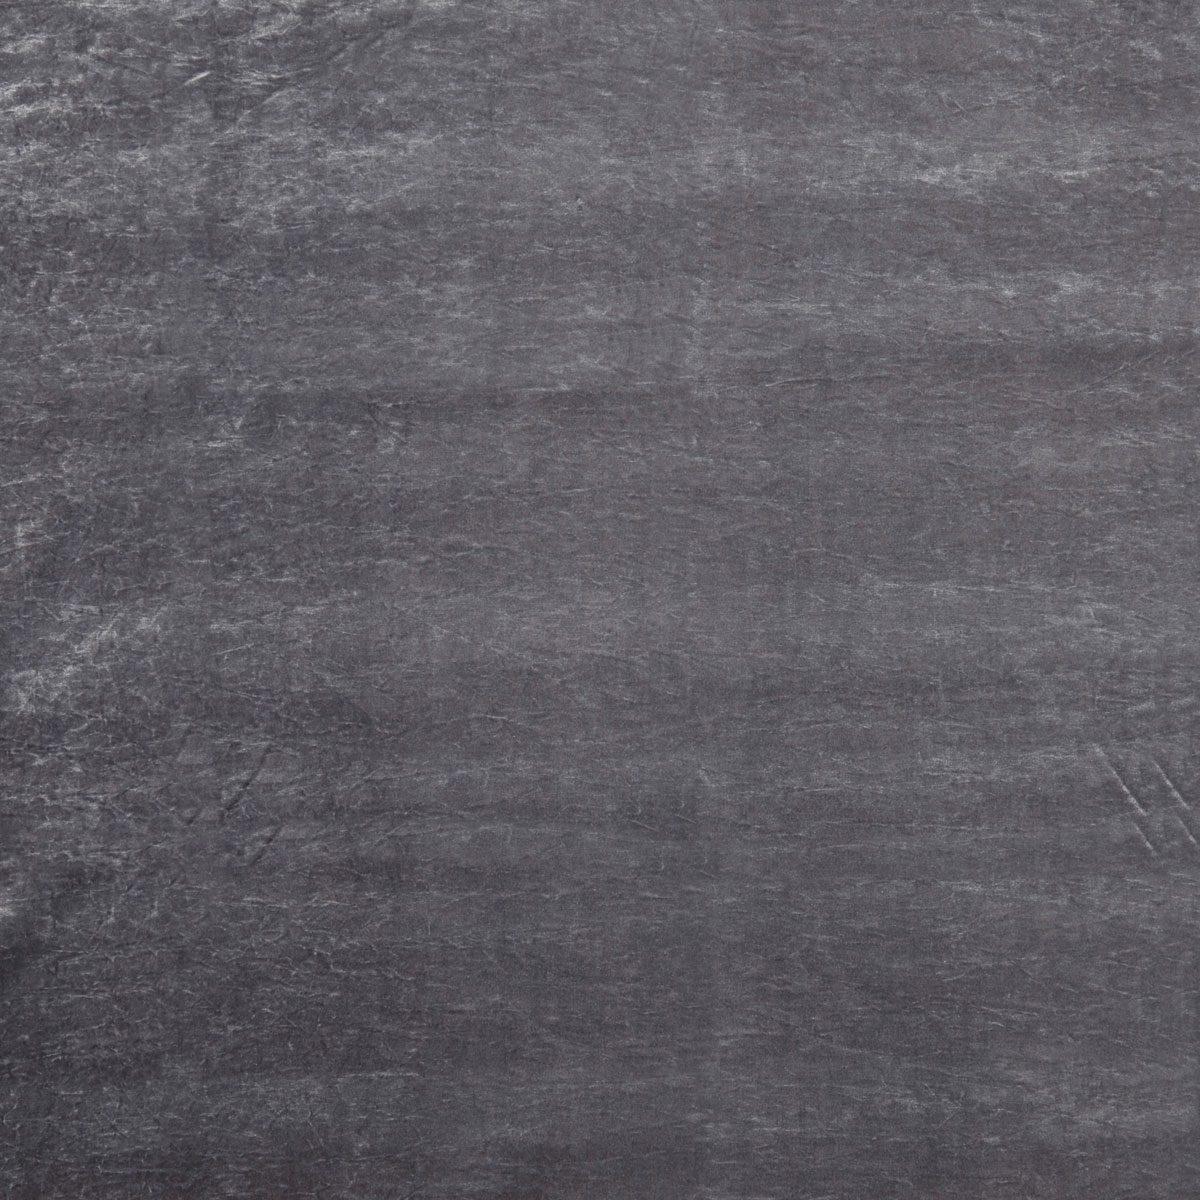 Lavender Marble Velour Fabric